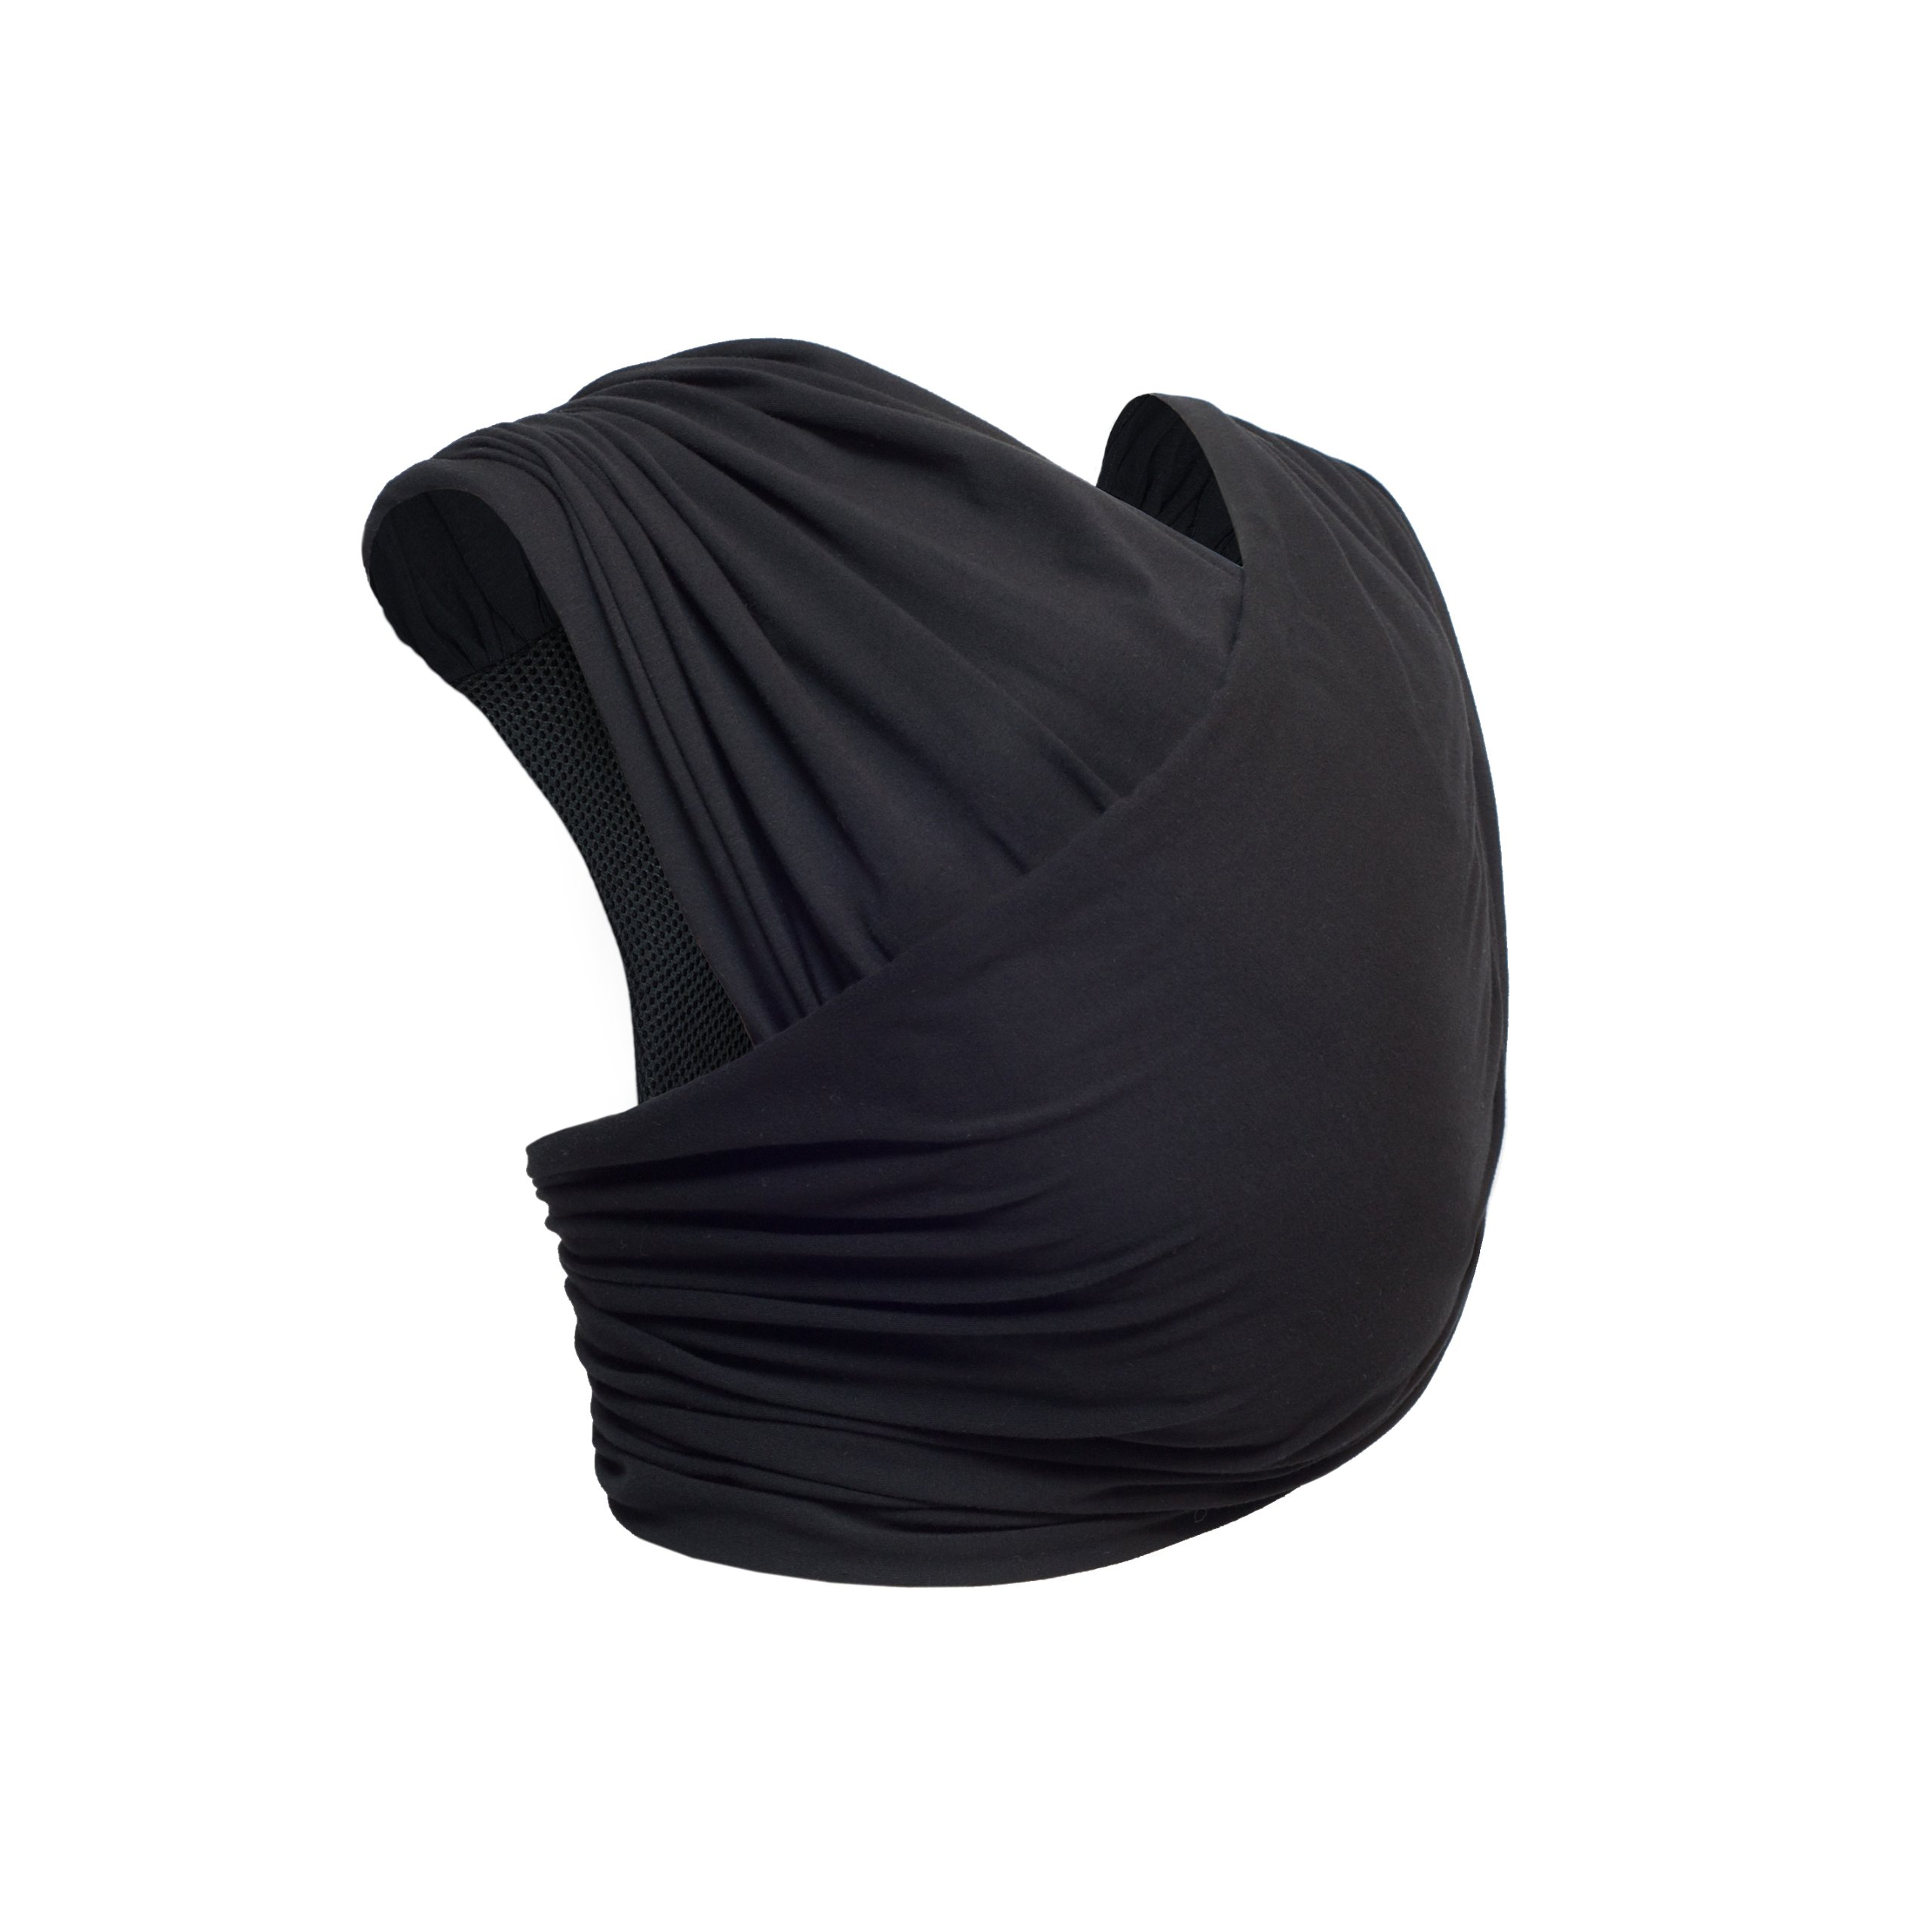 JJ Cole Agility Stretch Carrier, Black, Large